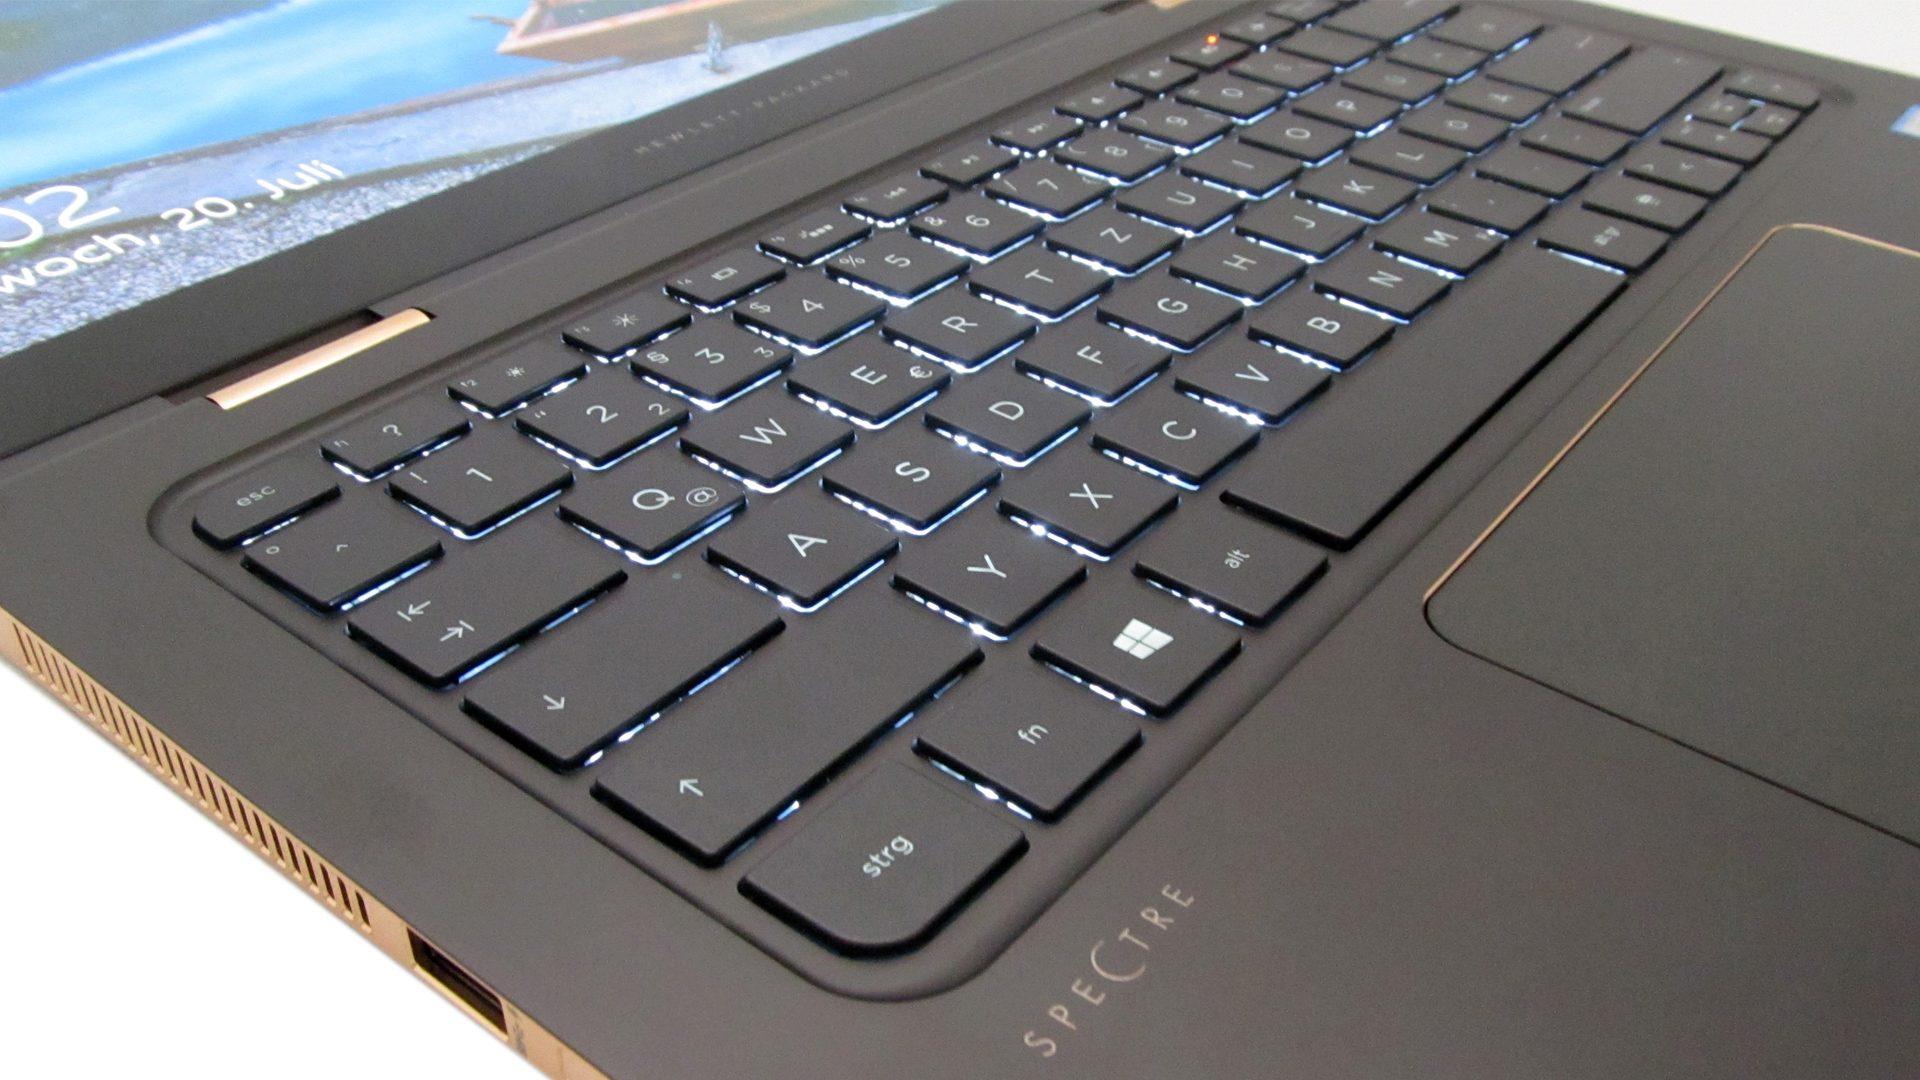 HP_Spectre_OLED-Tastatur_5